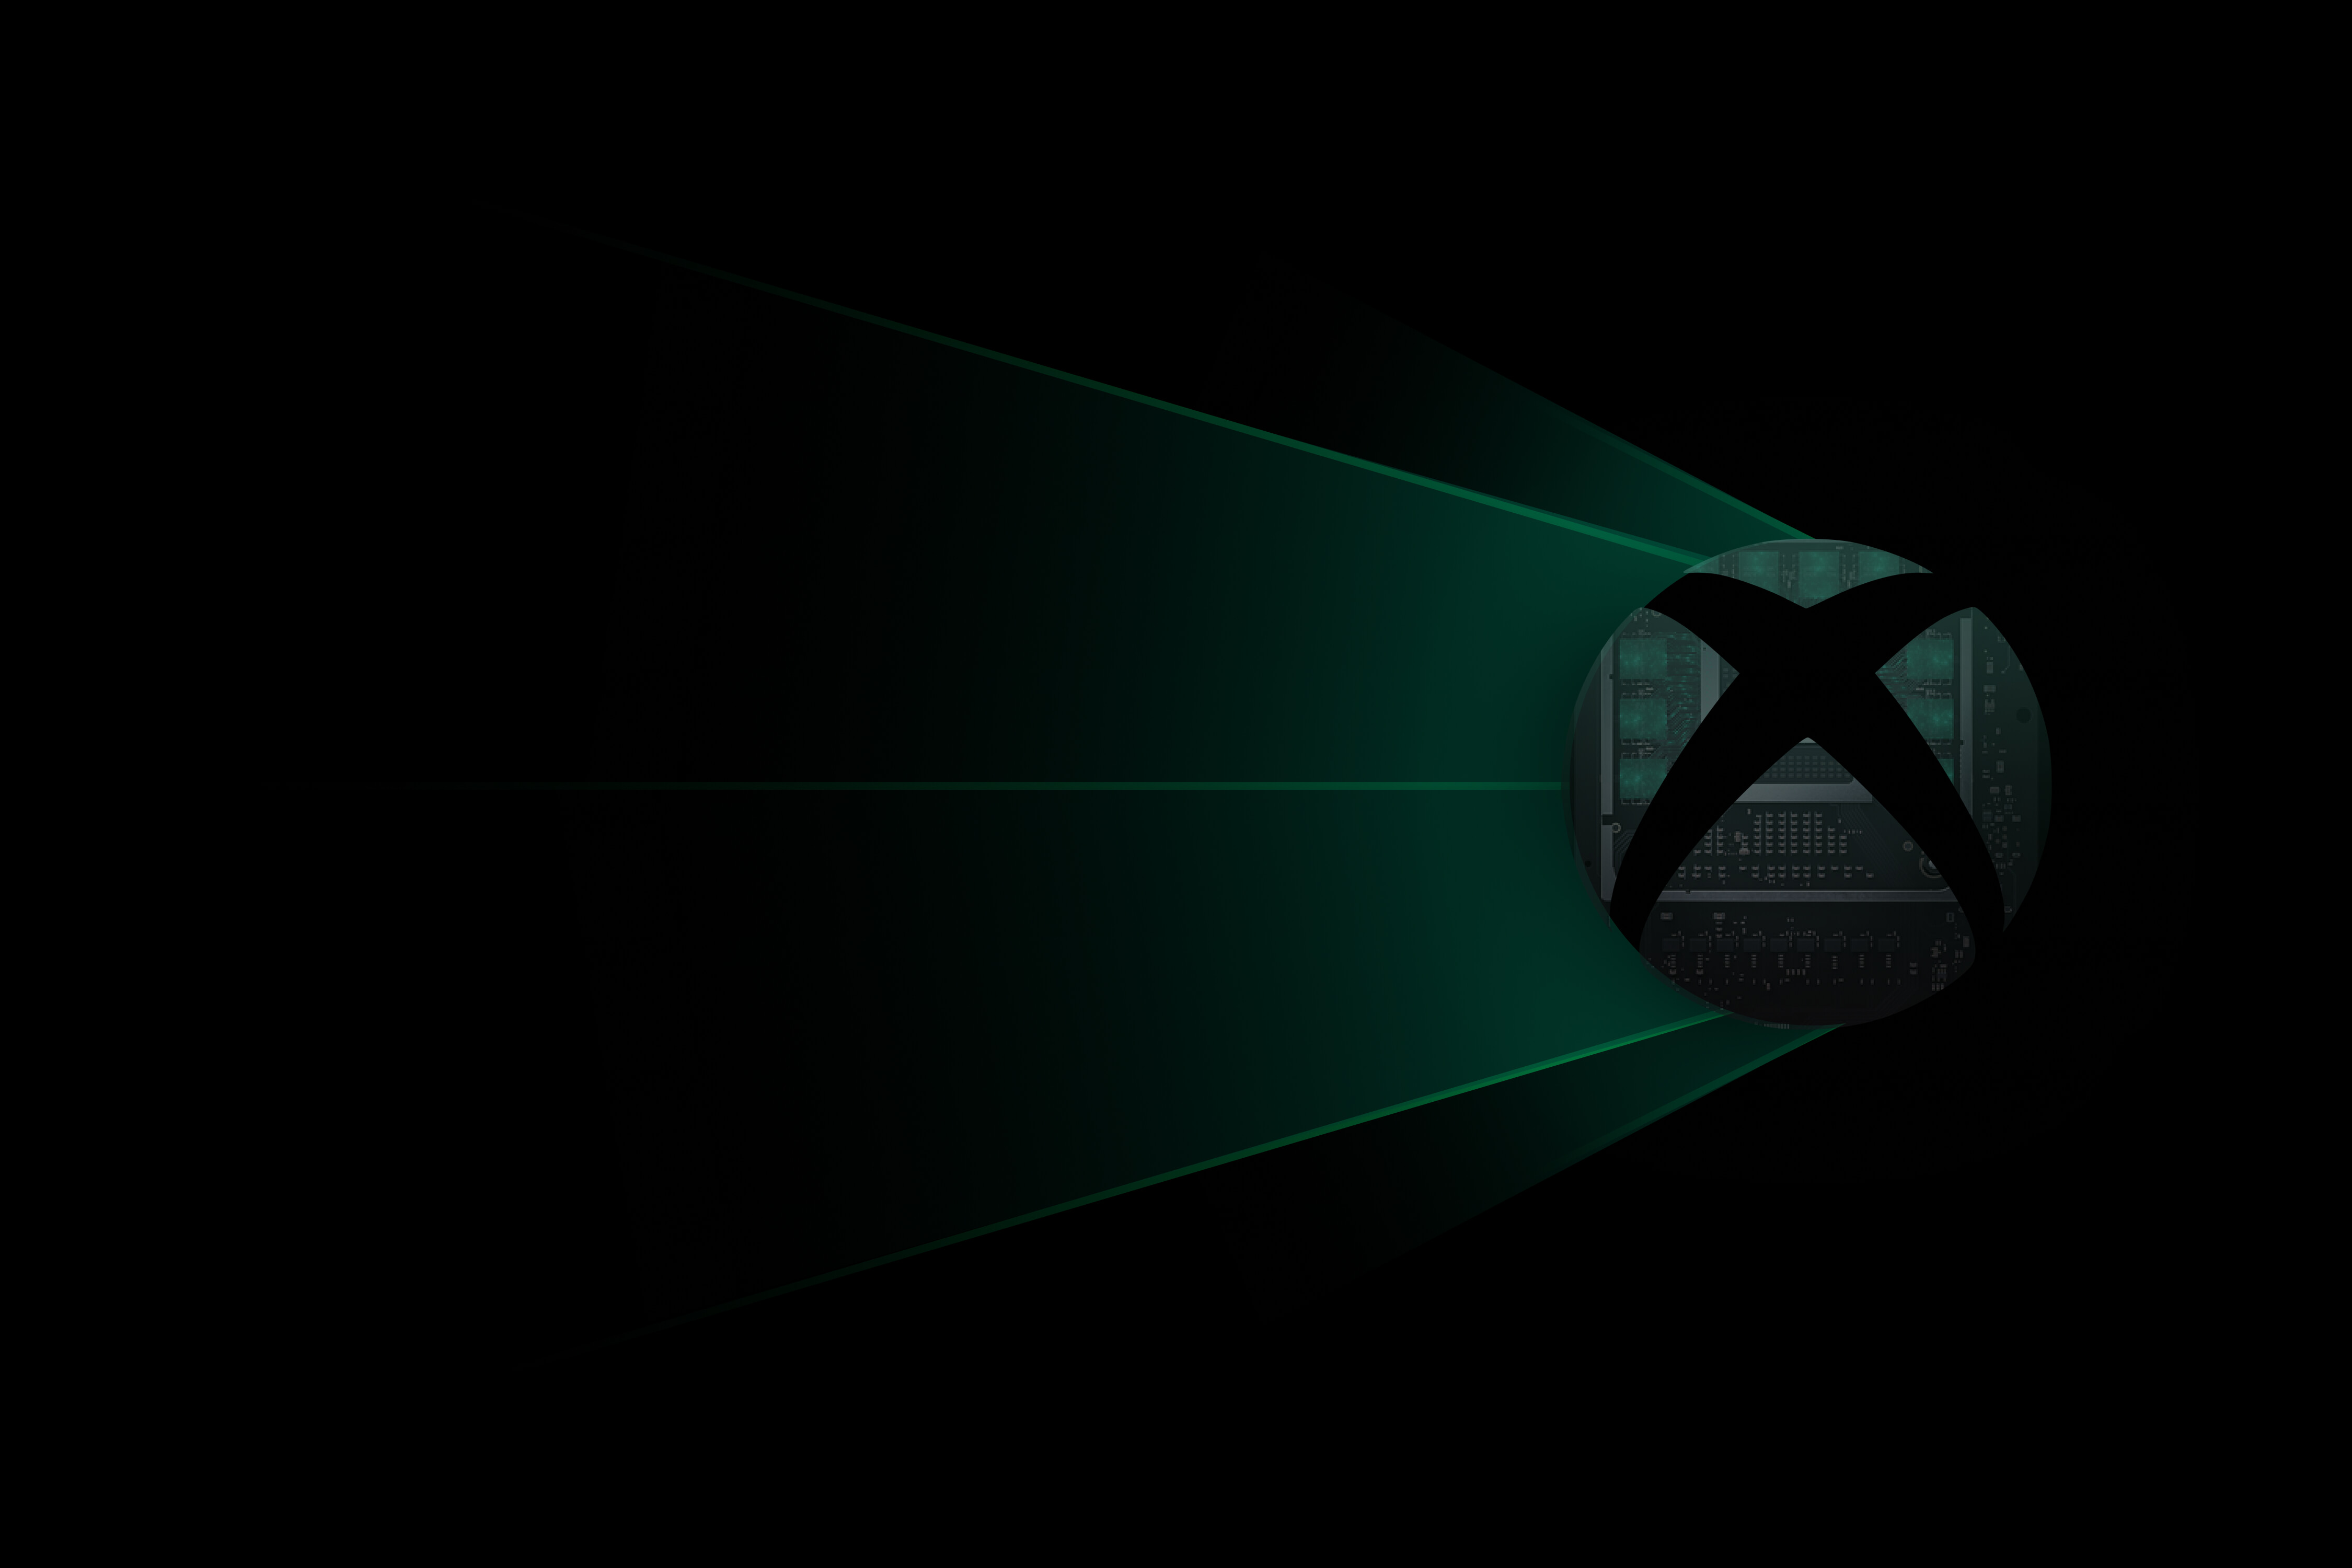 Xbox Series X Glow By Zee Al Eid Ahmad Rana Wallpapers Wallpaperhub